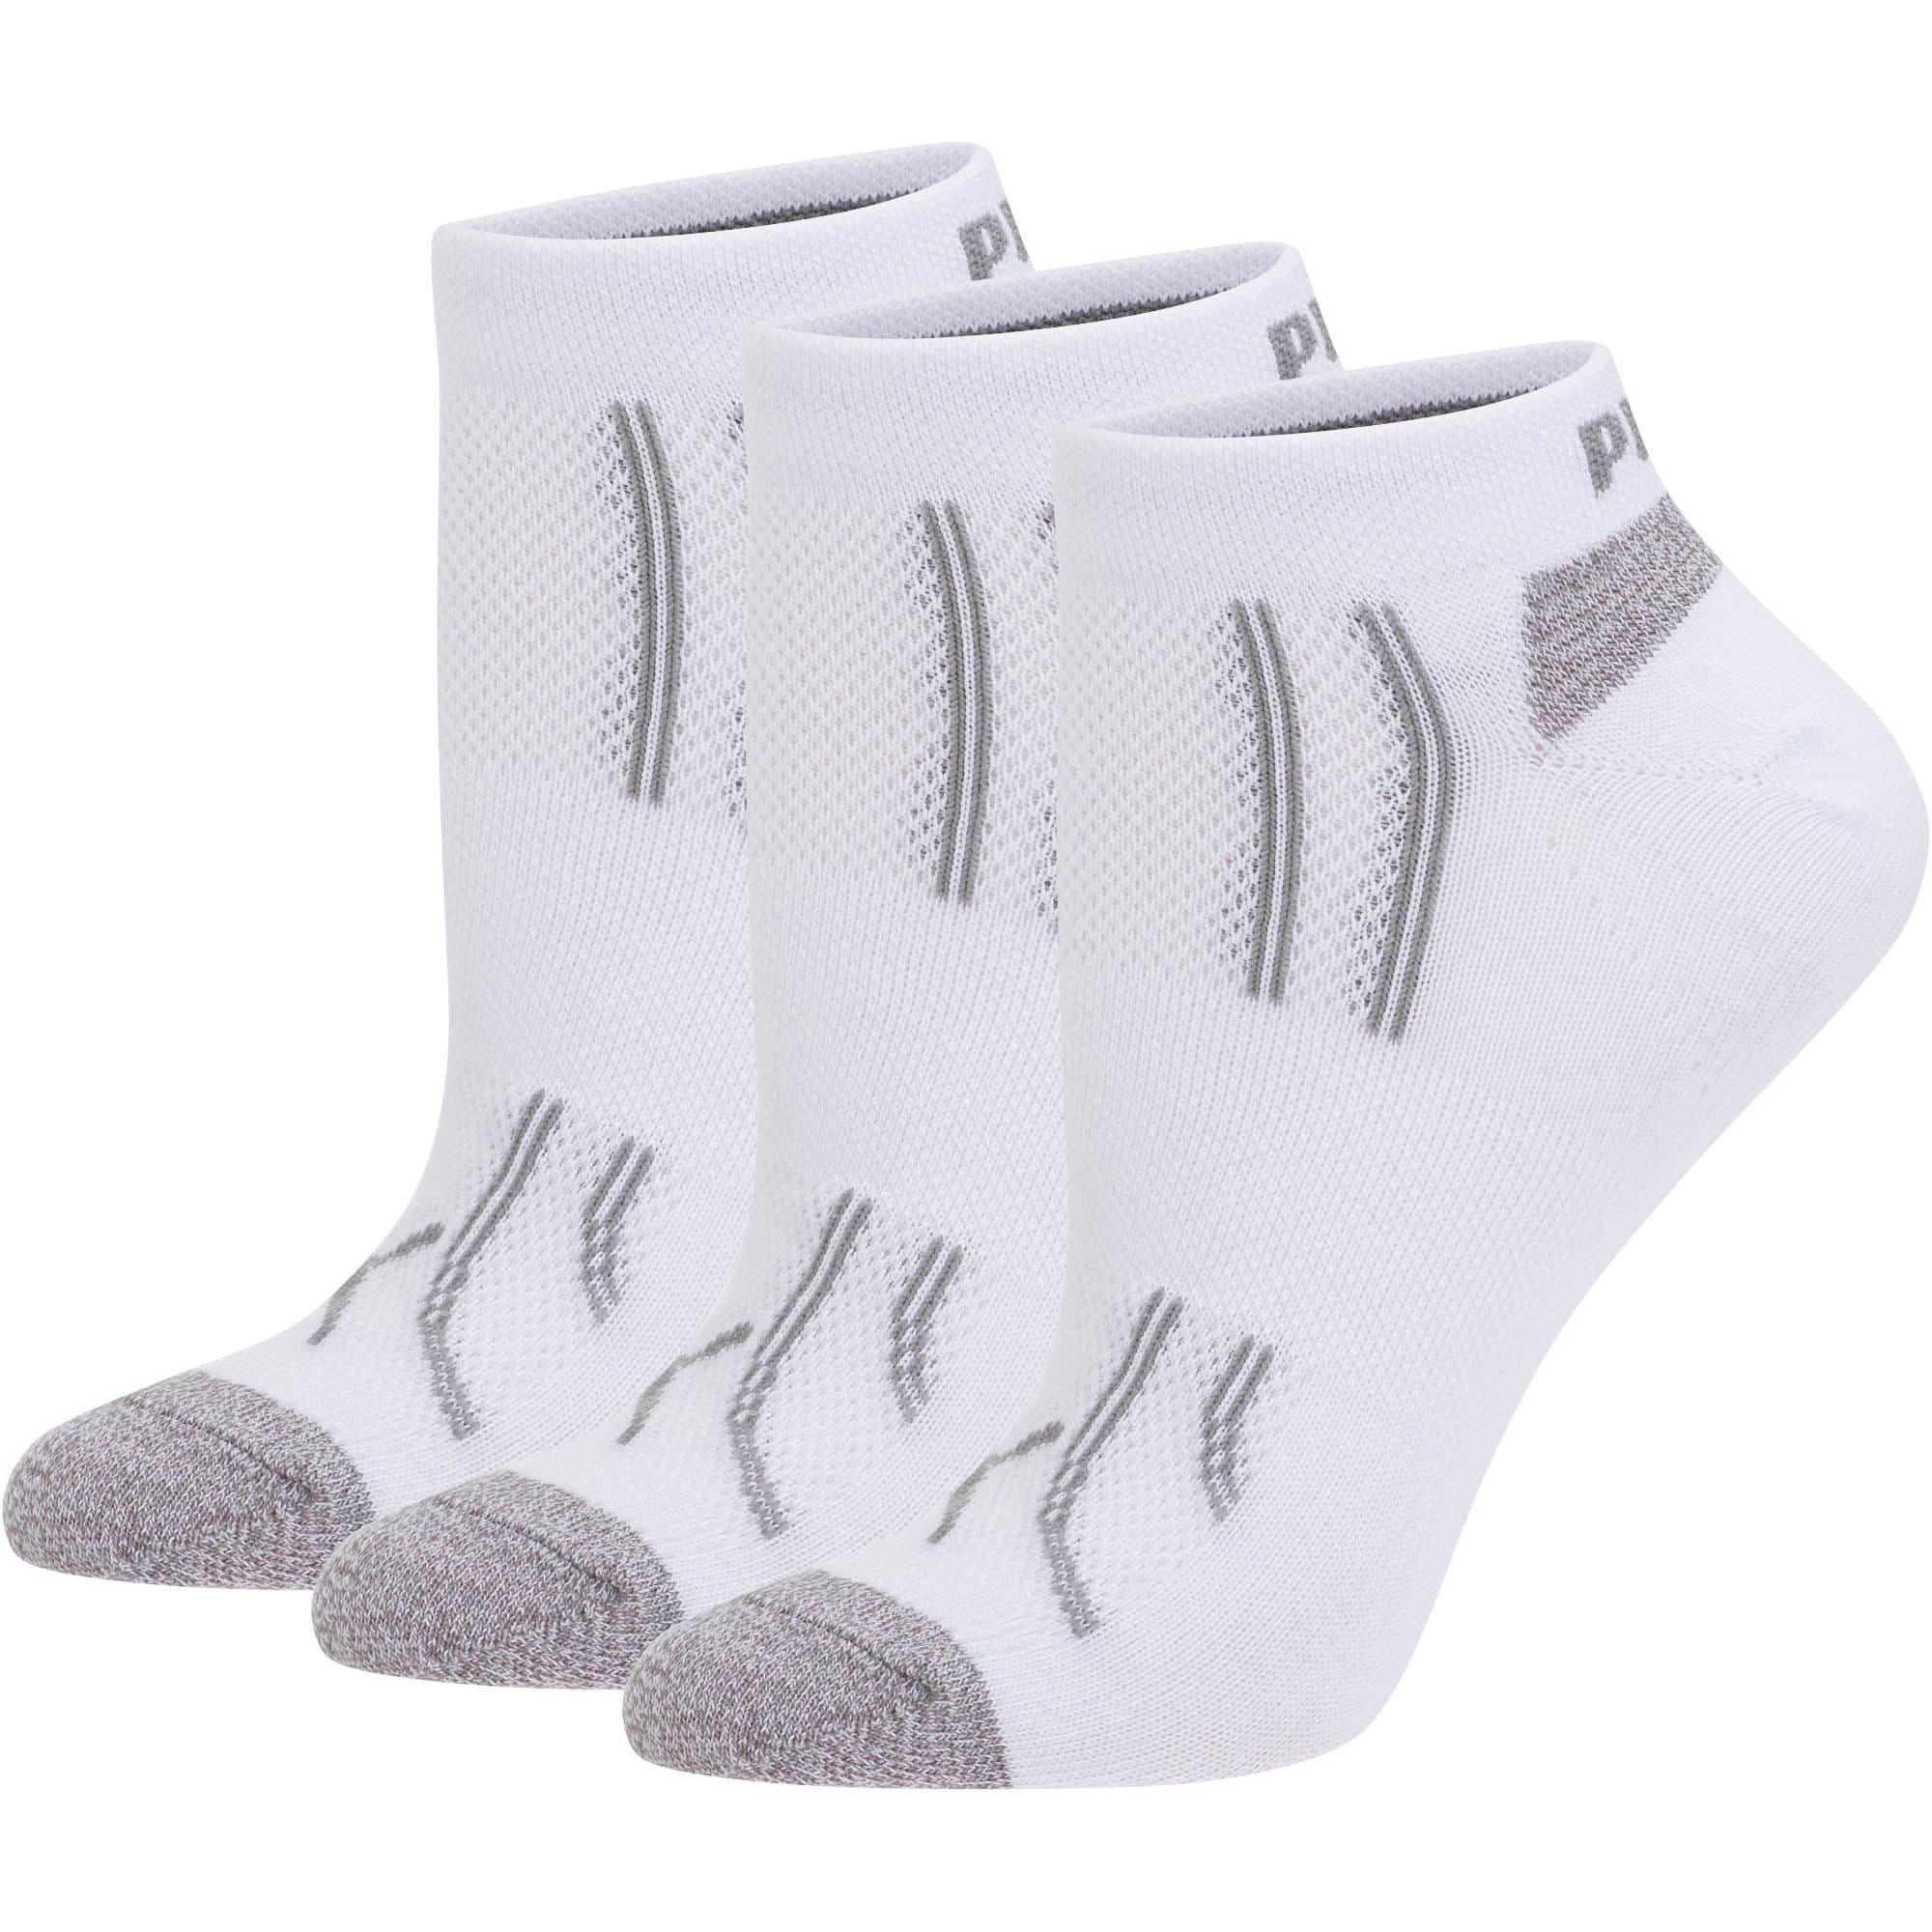 Thumbnail 1 of Modal Women's Low Cut Socks [3 Pack], white-steel grey, medium